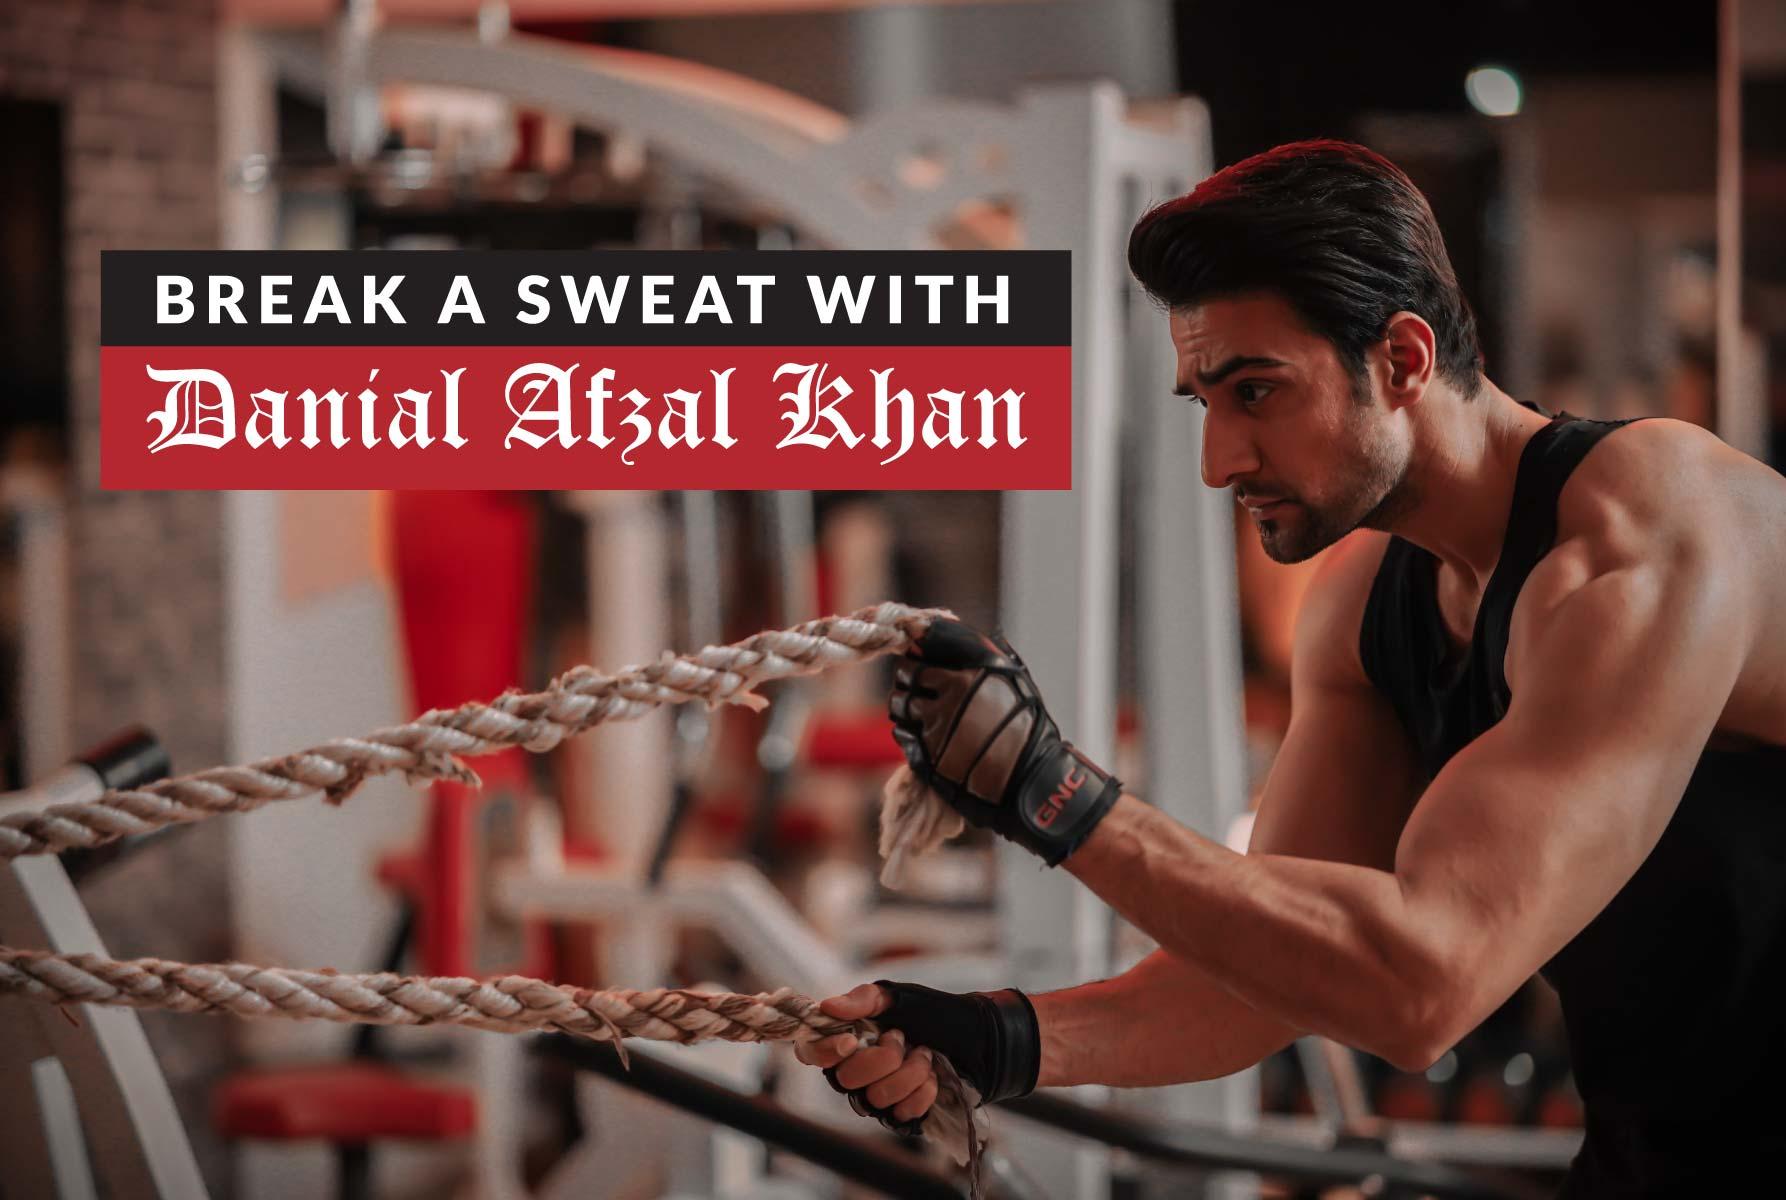 Interview of Danial Afzal Khan